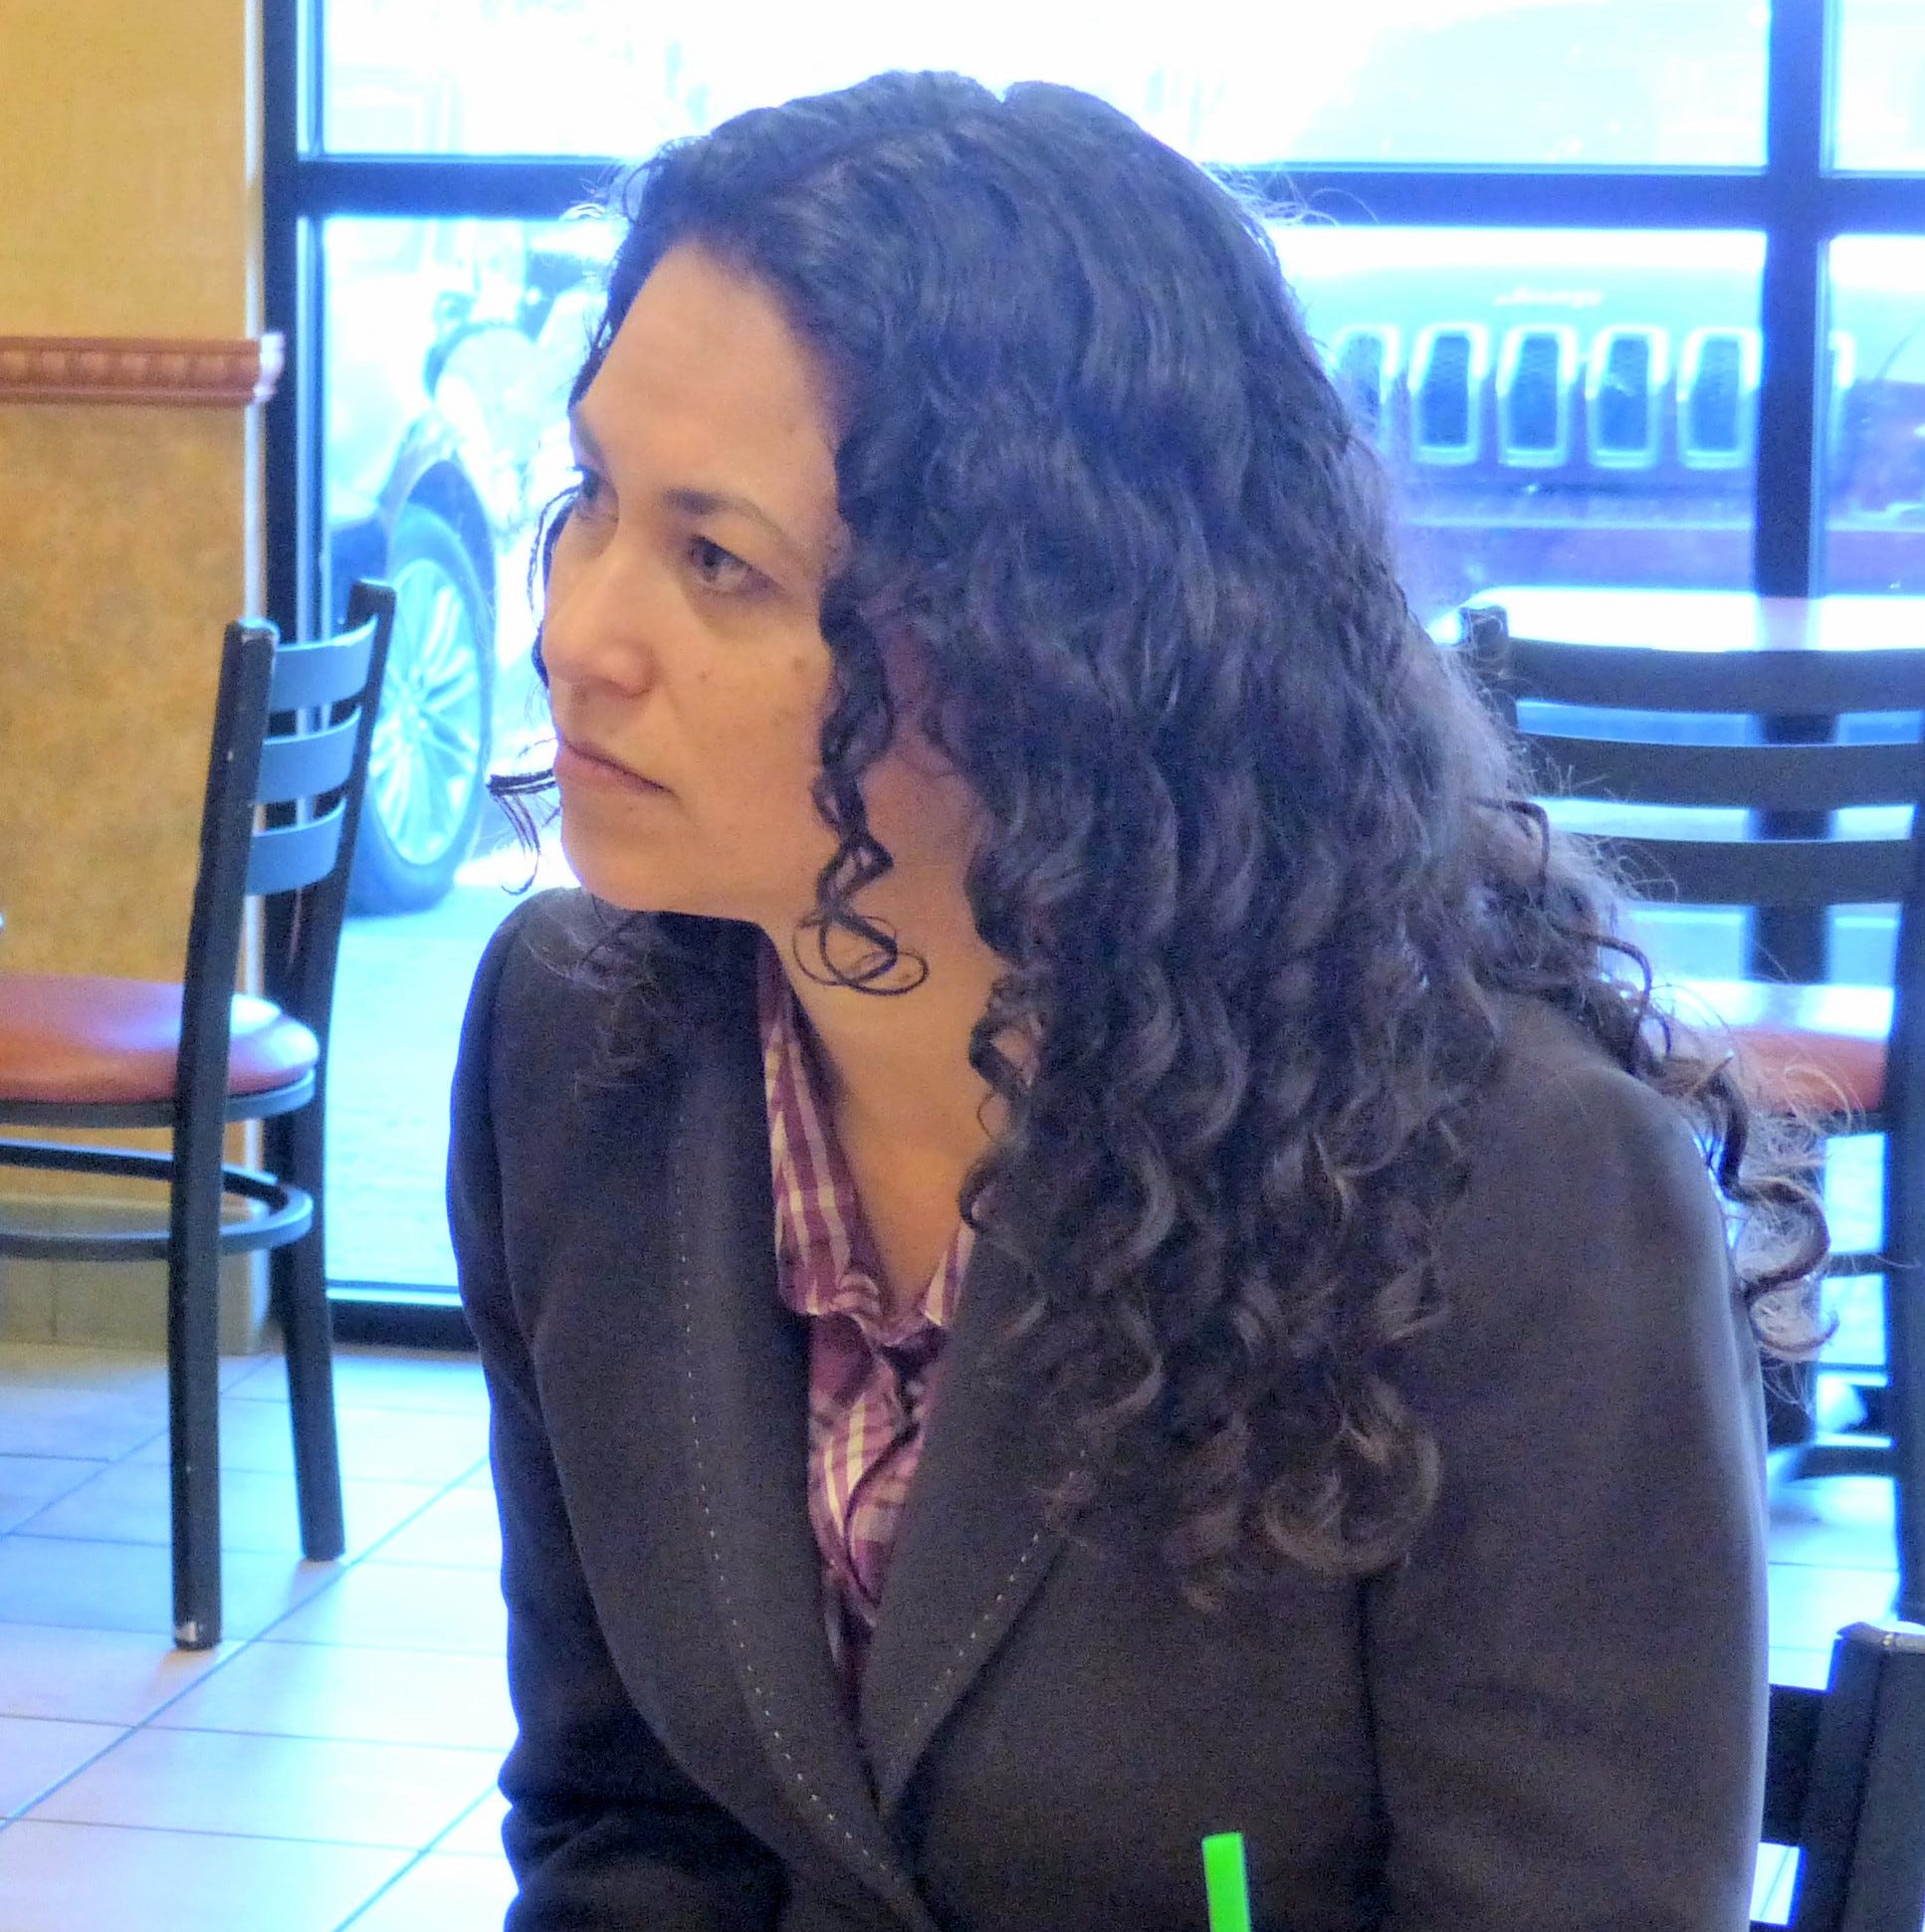 Xochitl Torres Small hears of service shortfall from Lincoln County veterans